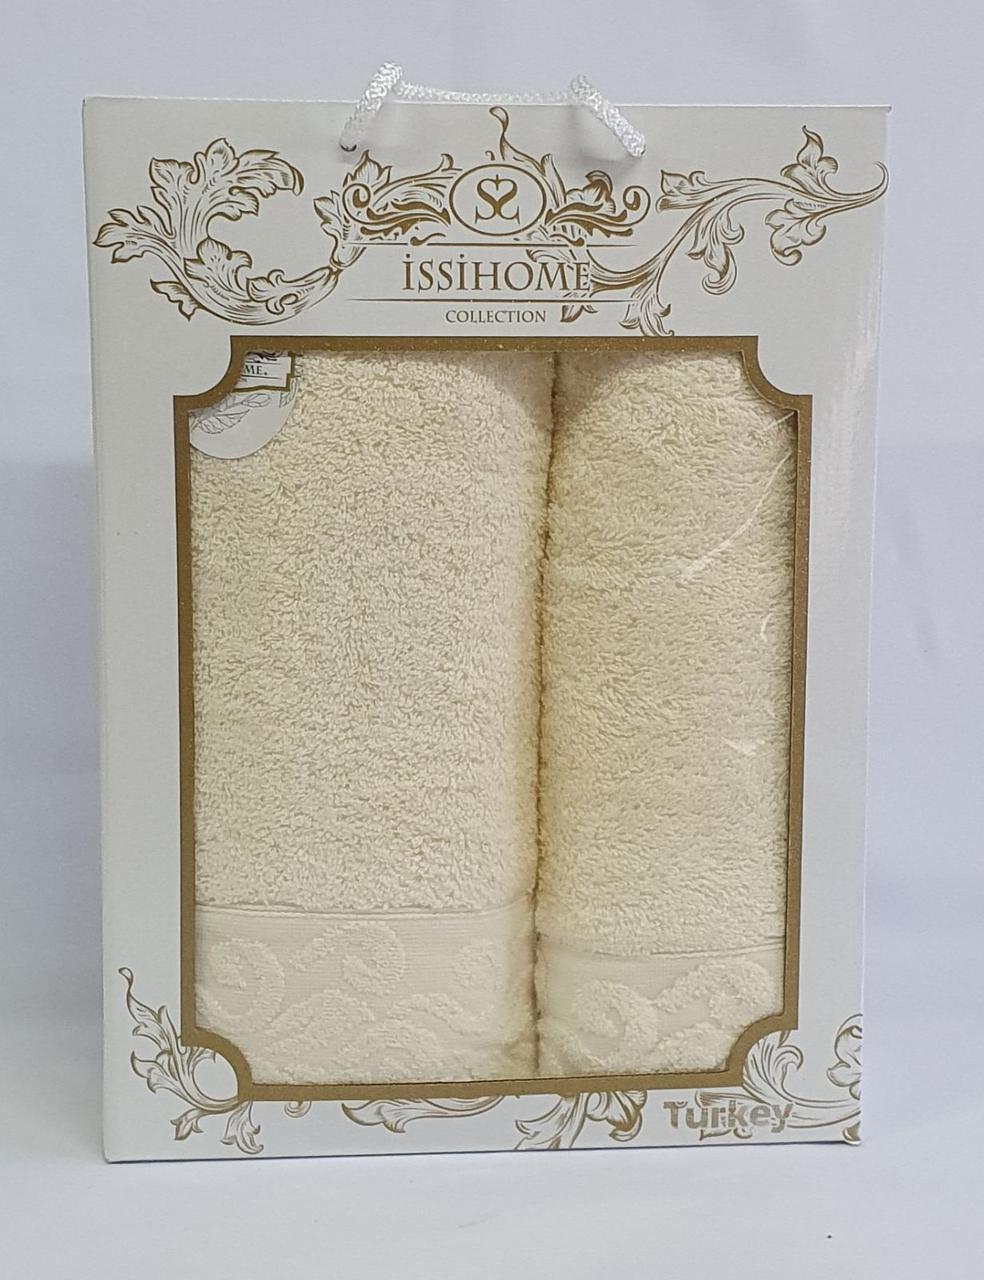 Набор махровых полотенец Issihome узор молочный